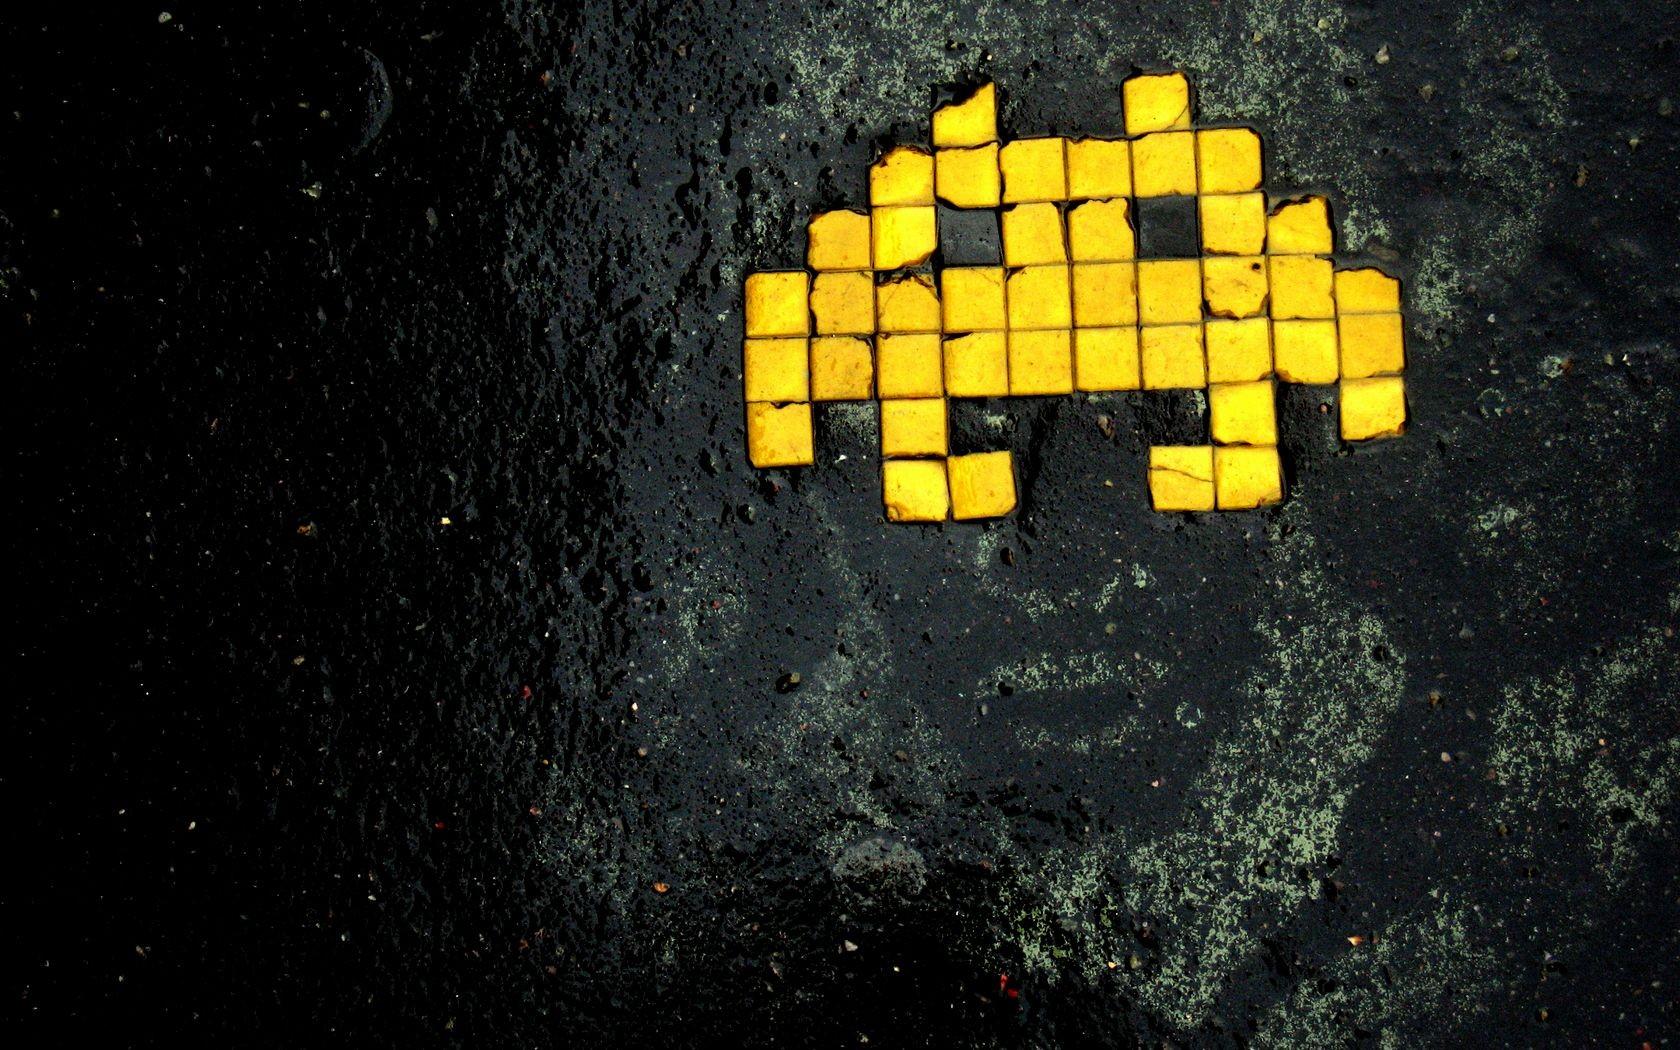 General 1680x1050 Space Invaders artwork retro games grunge yellow wet street macro black wet face pixel art asphalt